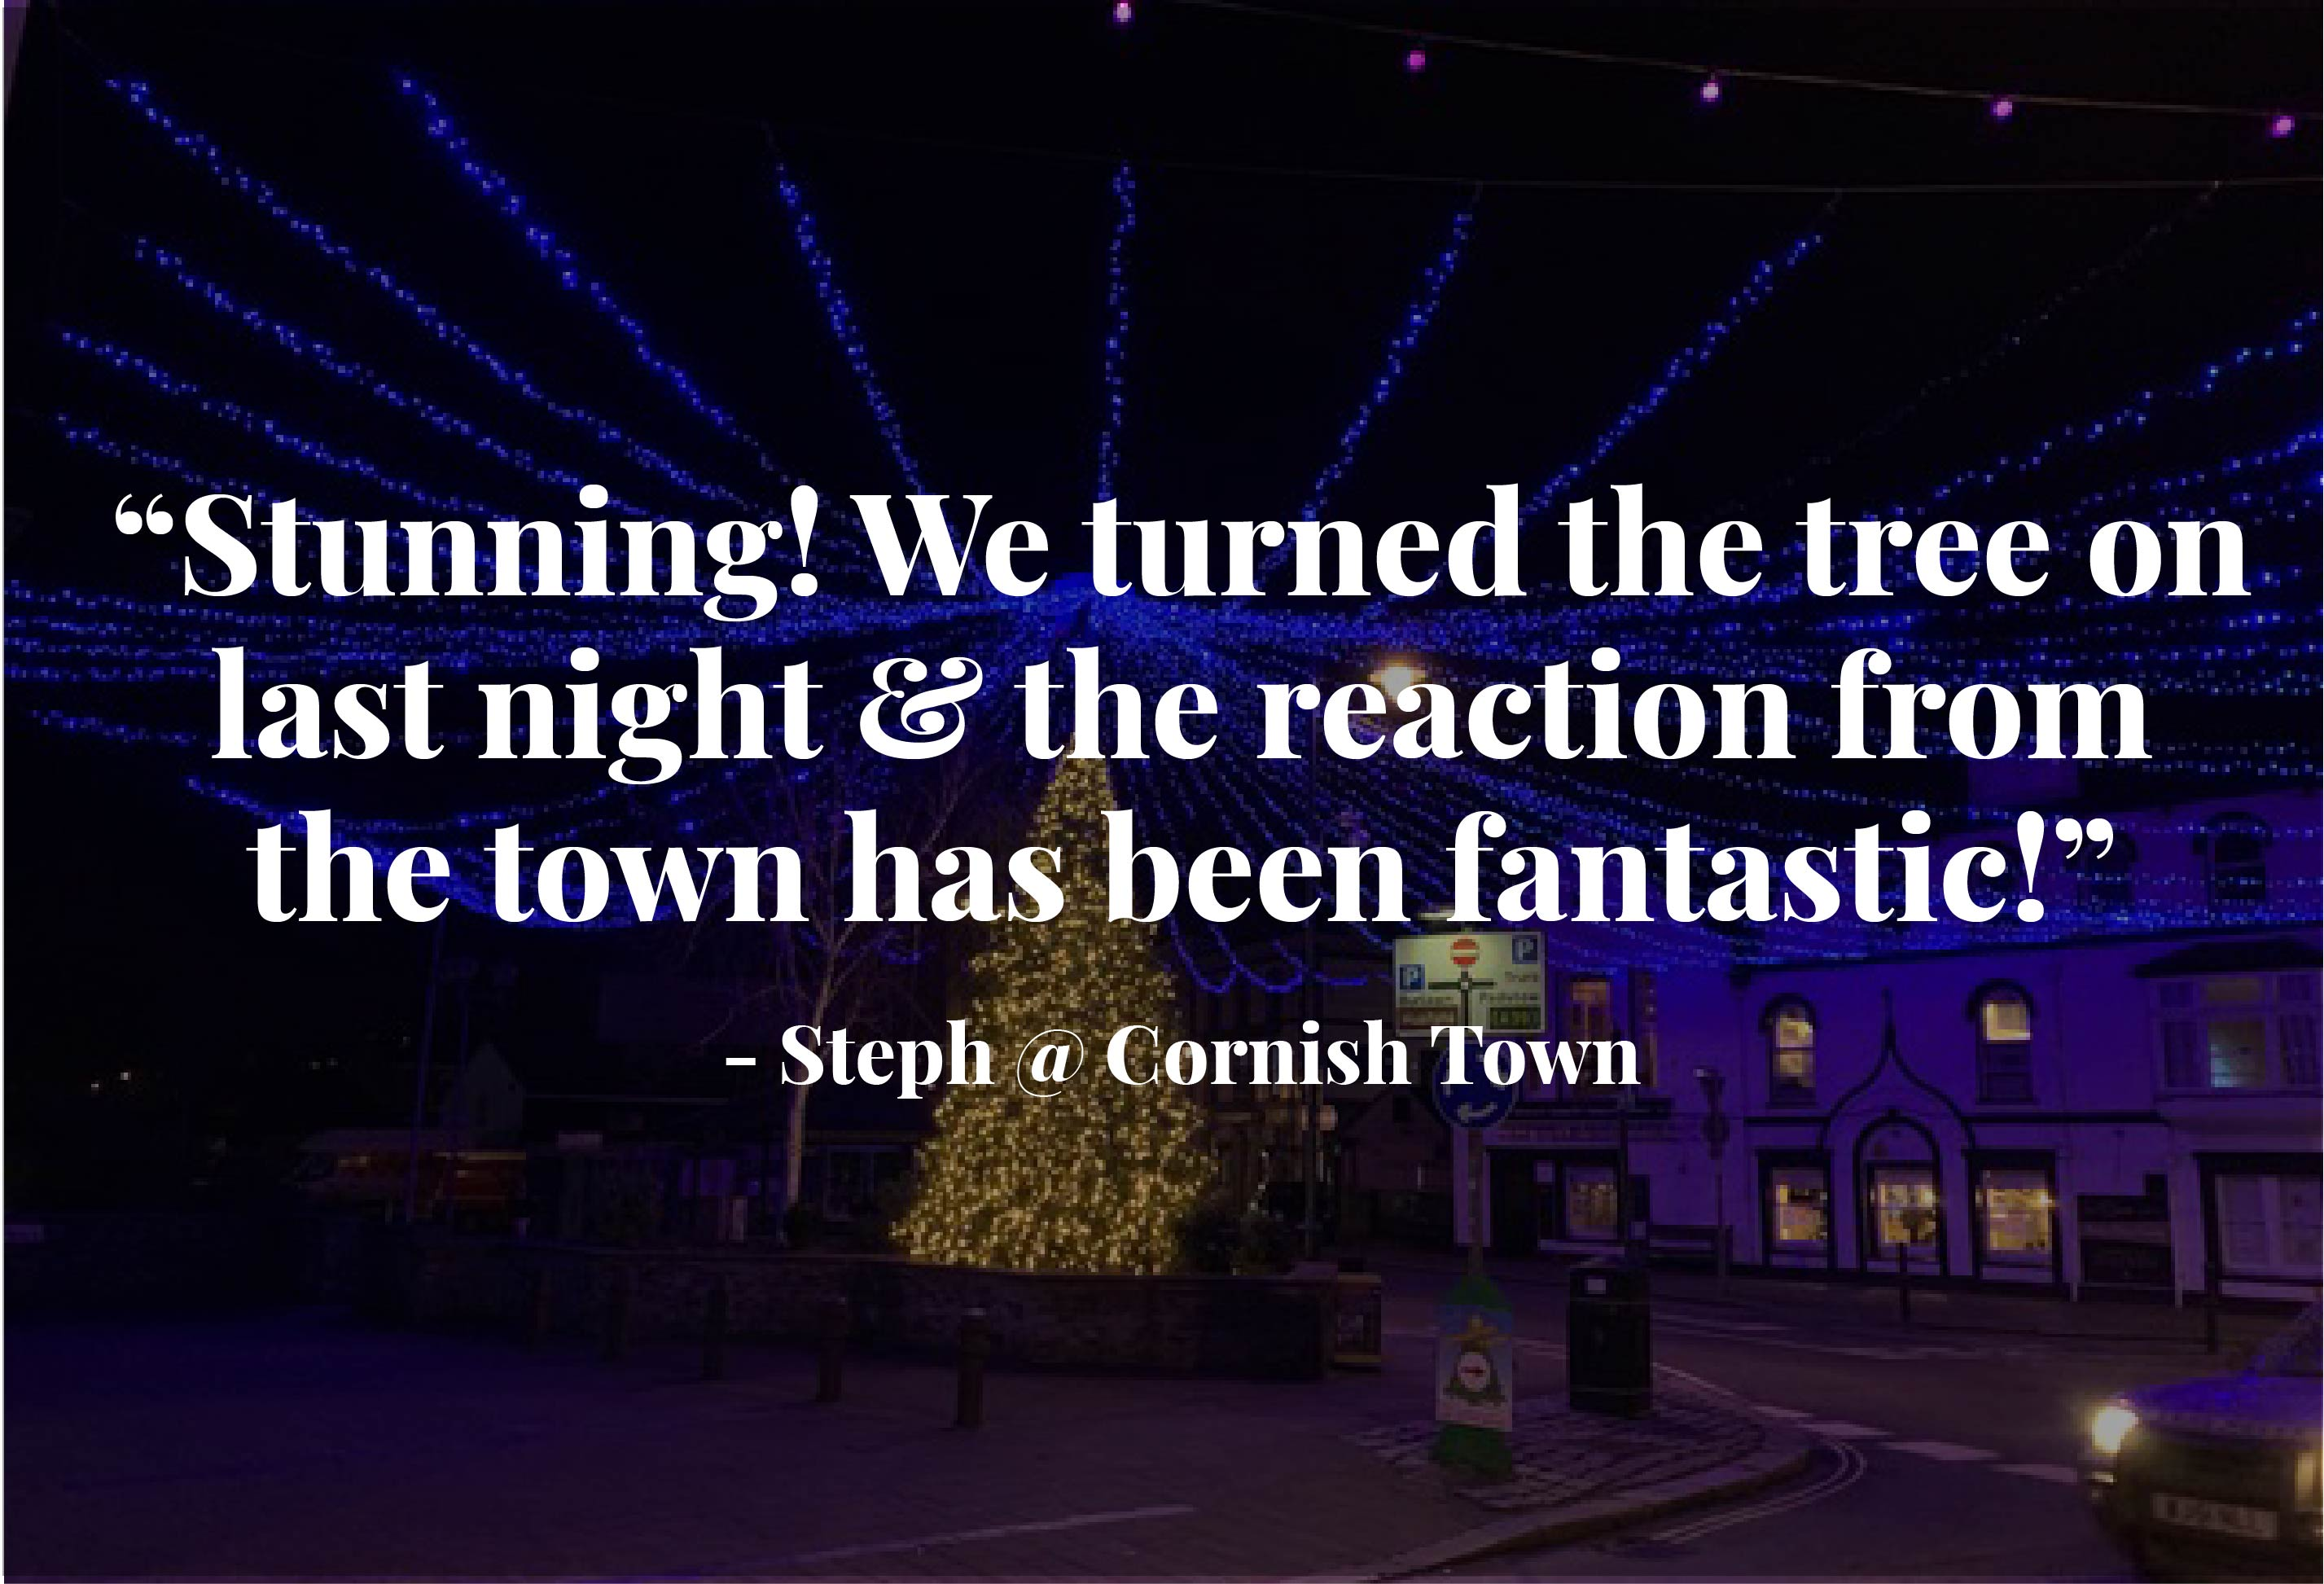 Steph Cornish Town